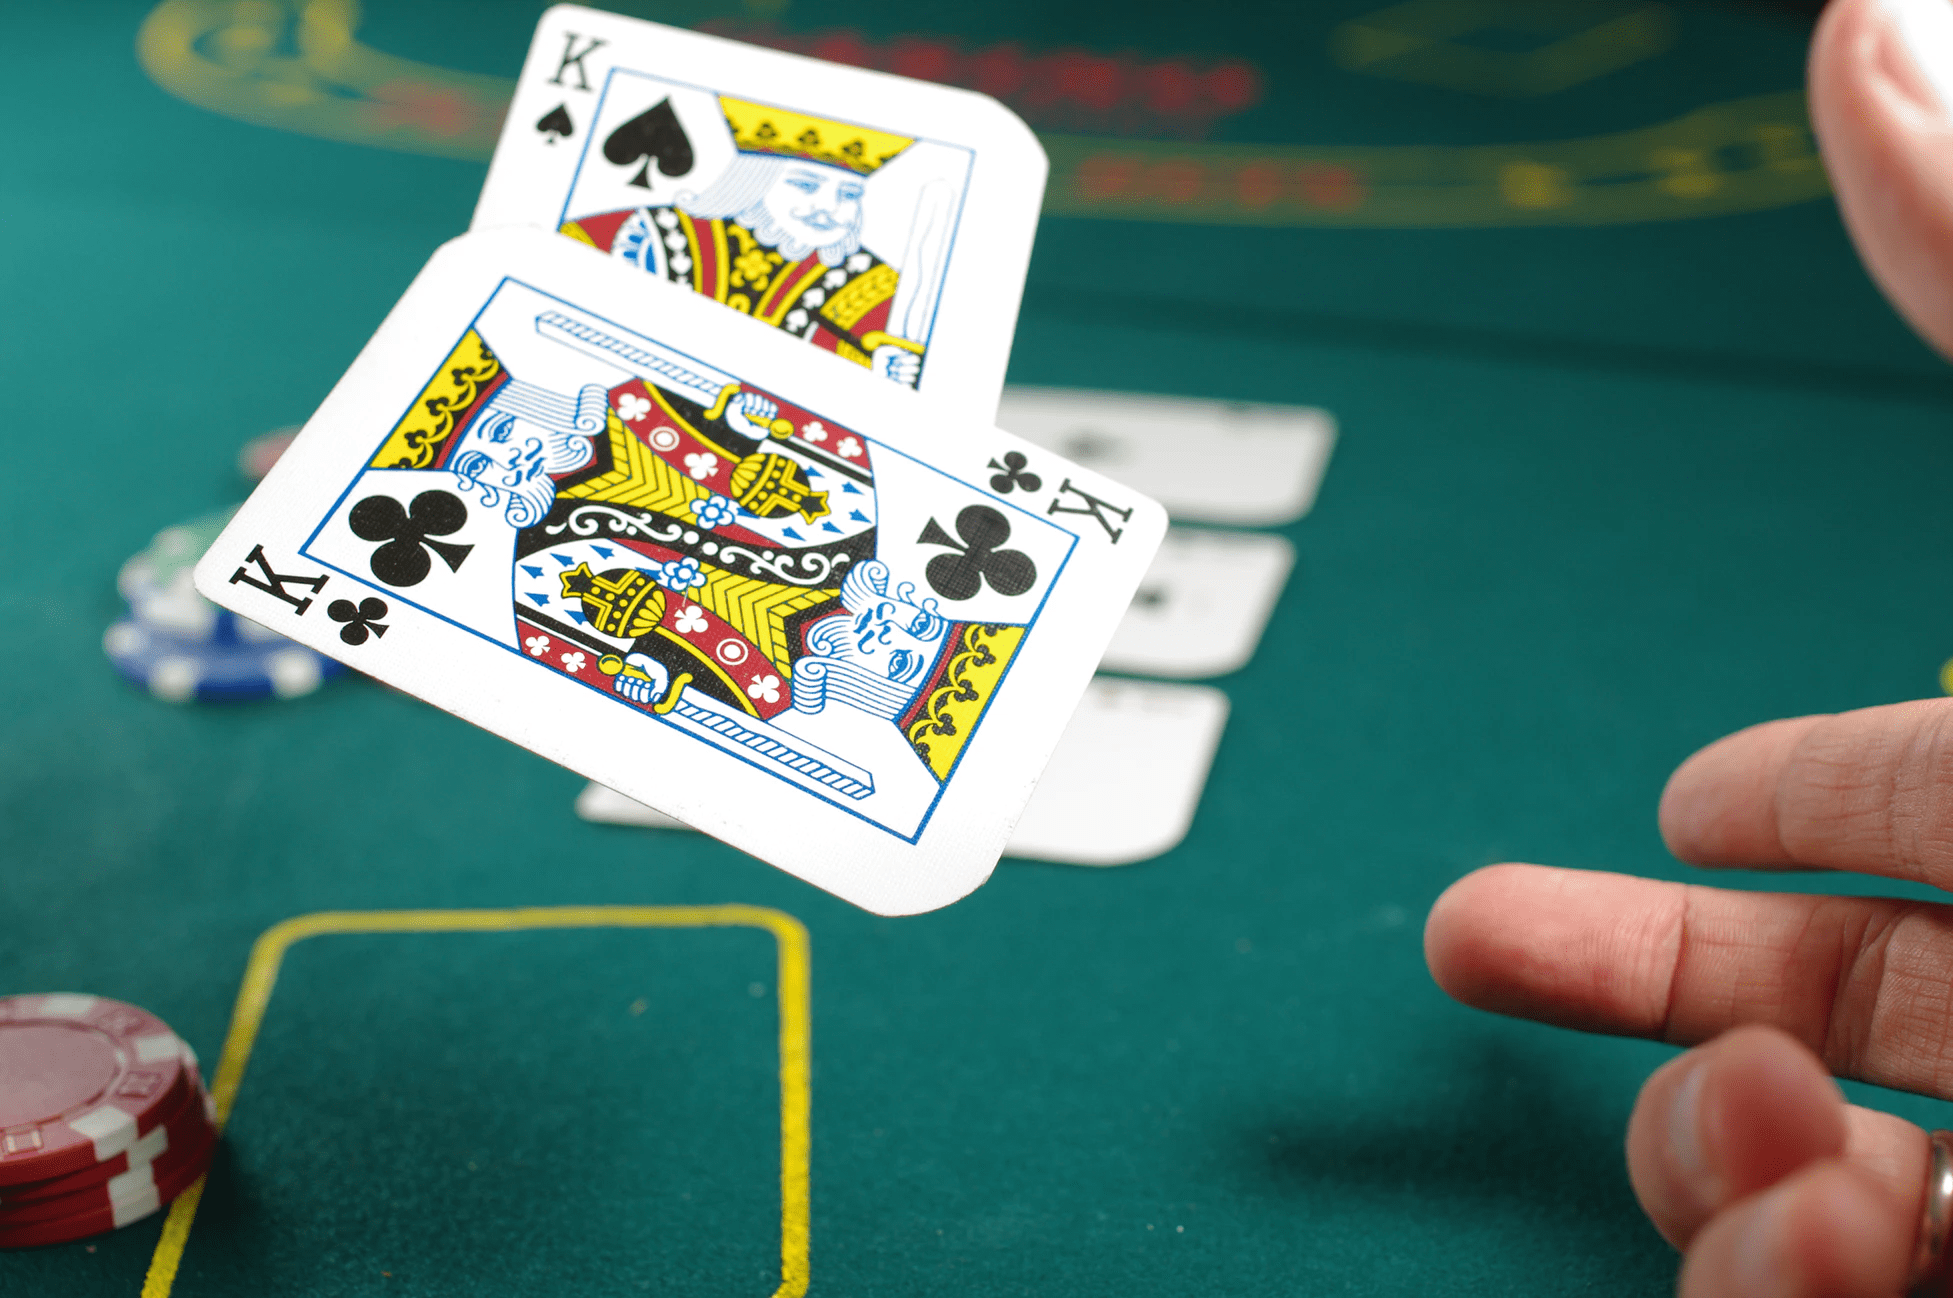 Online gambling